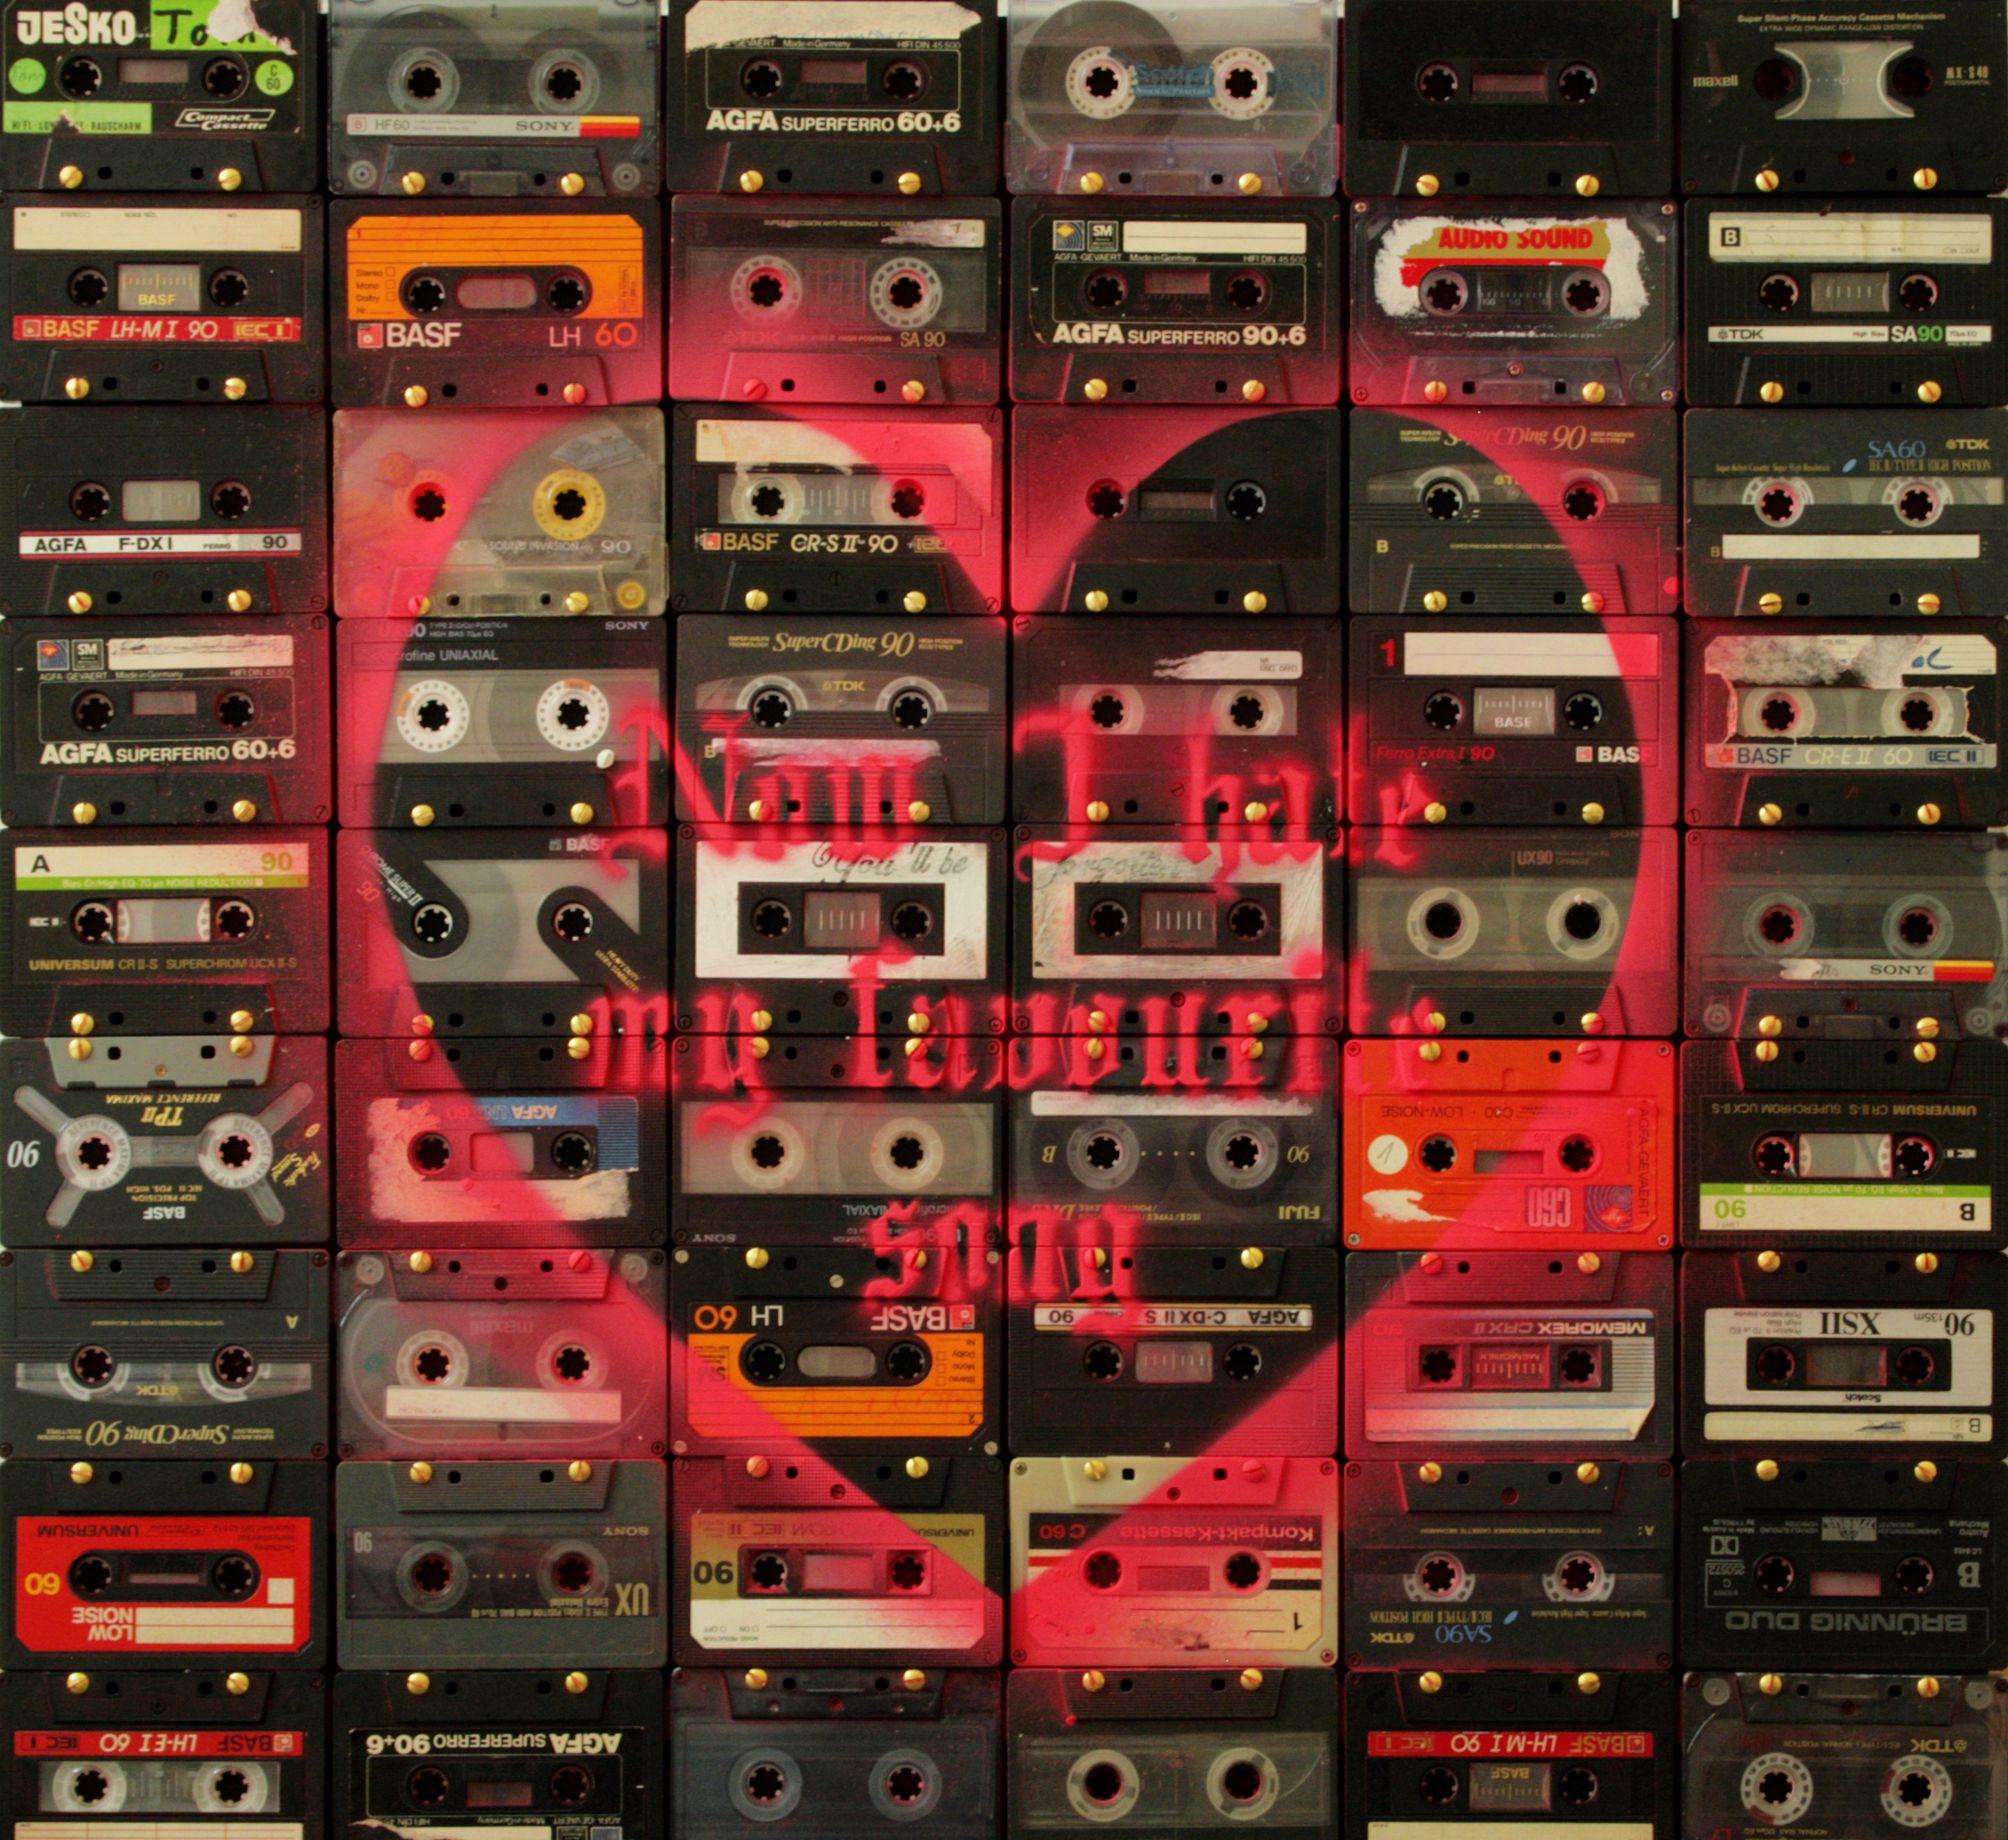 now I hate my favourite song | 2013 #kativonschwerin #art #music #cassette #mixtape #contemporaryart #germanart #berlin  www.kativonschwerin.de